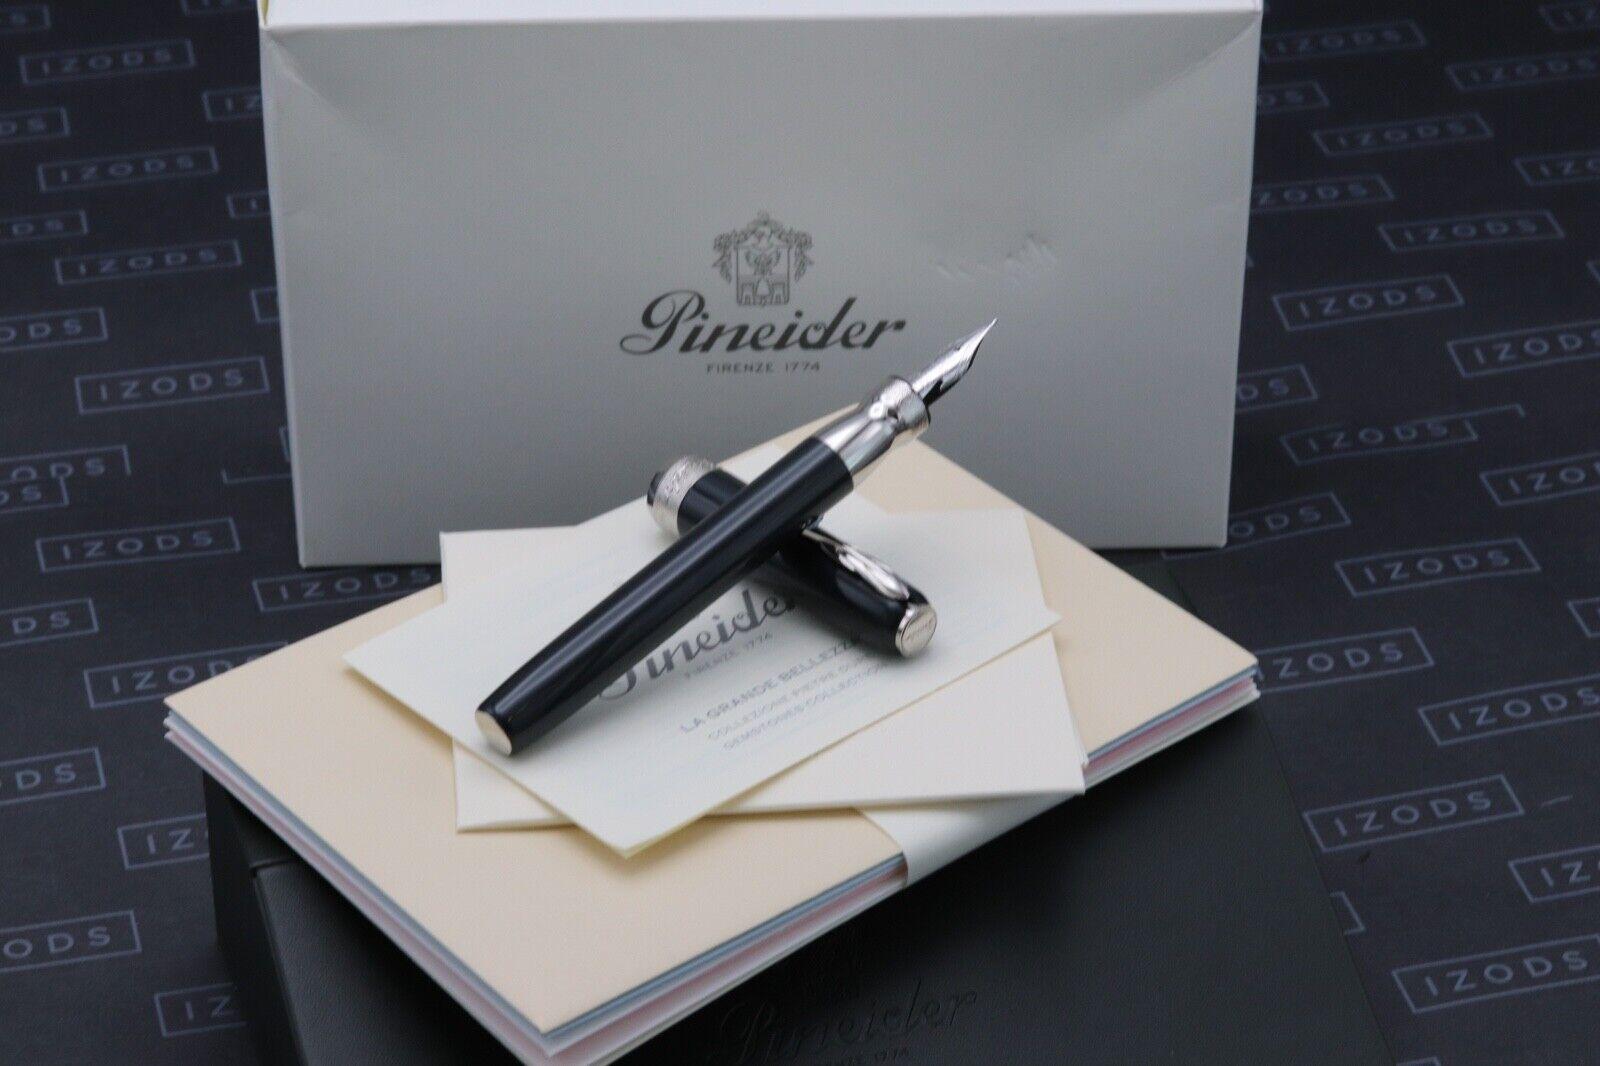 Pineider La Grande Bellezza Gemstones Hematite Grey Fountain Pen